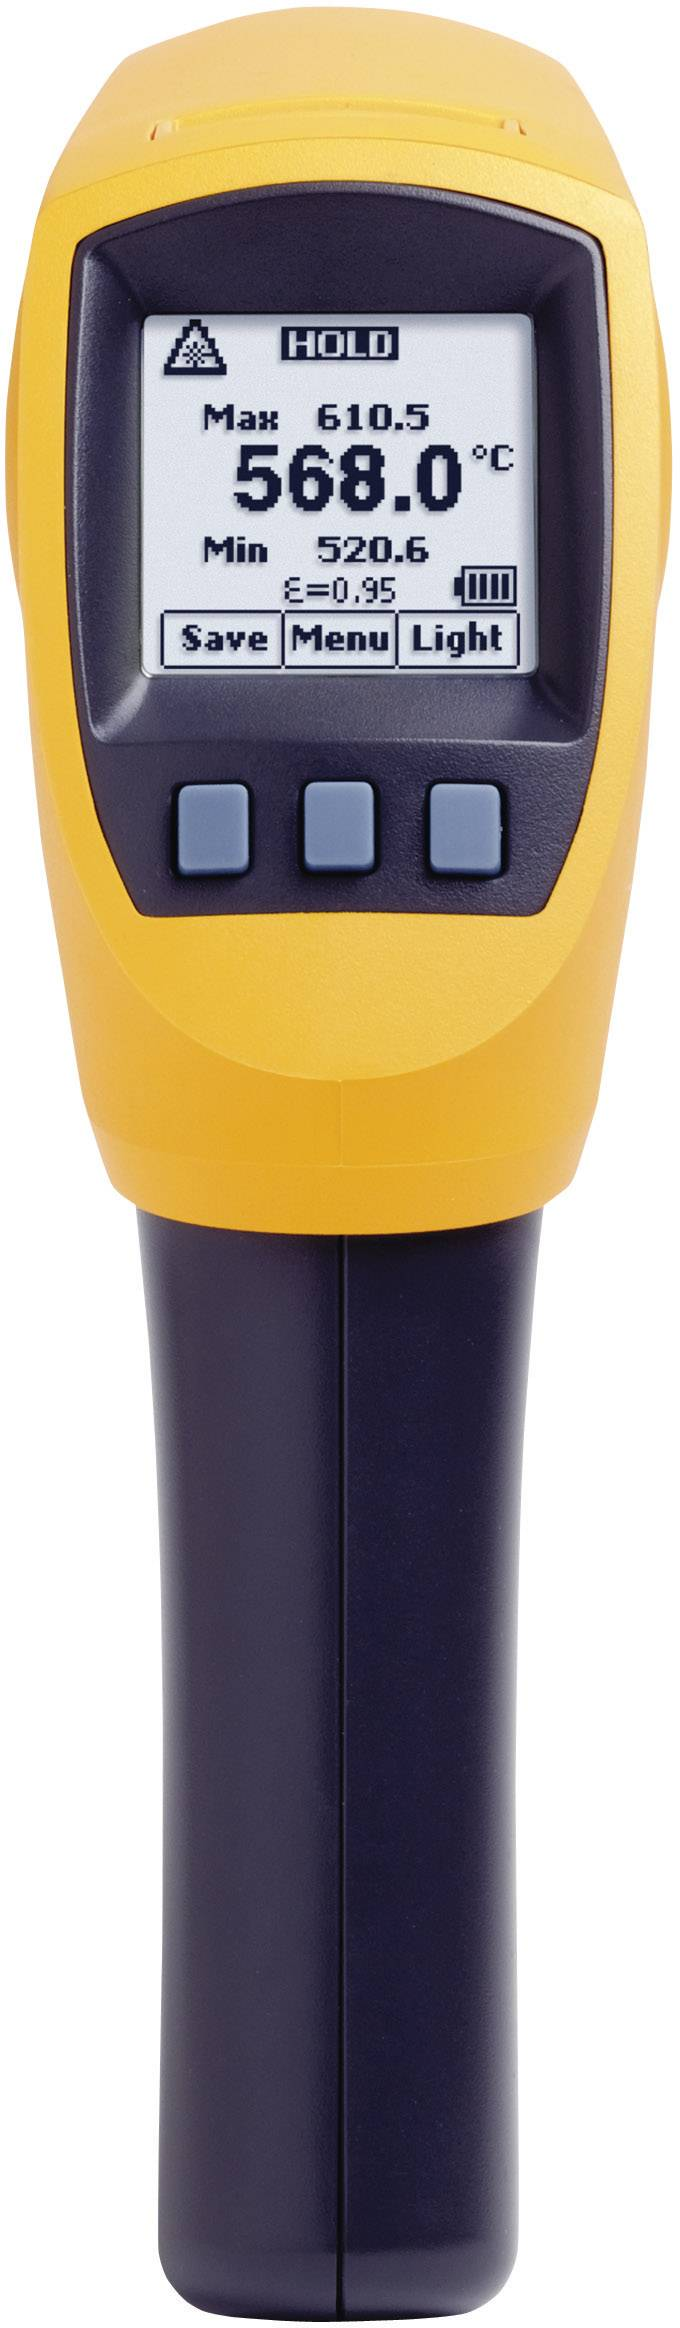 IR teplomer Fluke 568, IR: -40 až +800 °C, K-Typ: -40 až +1372 °C